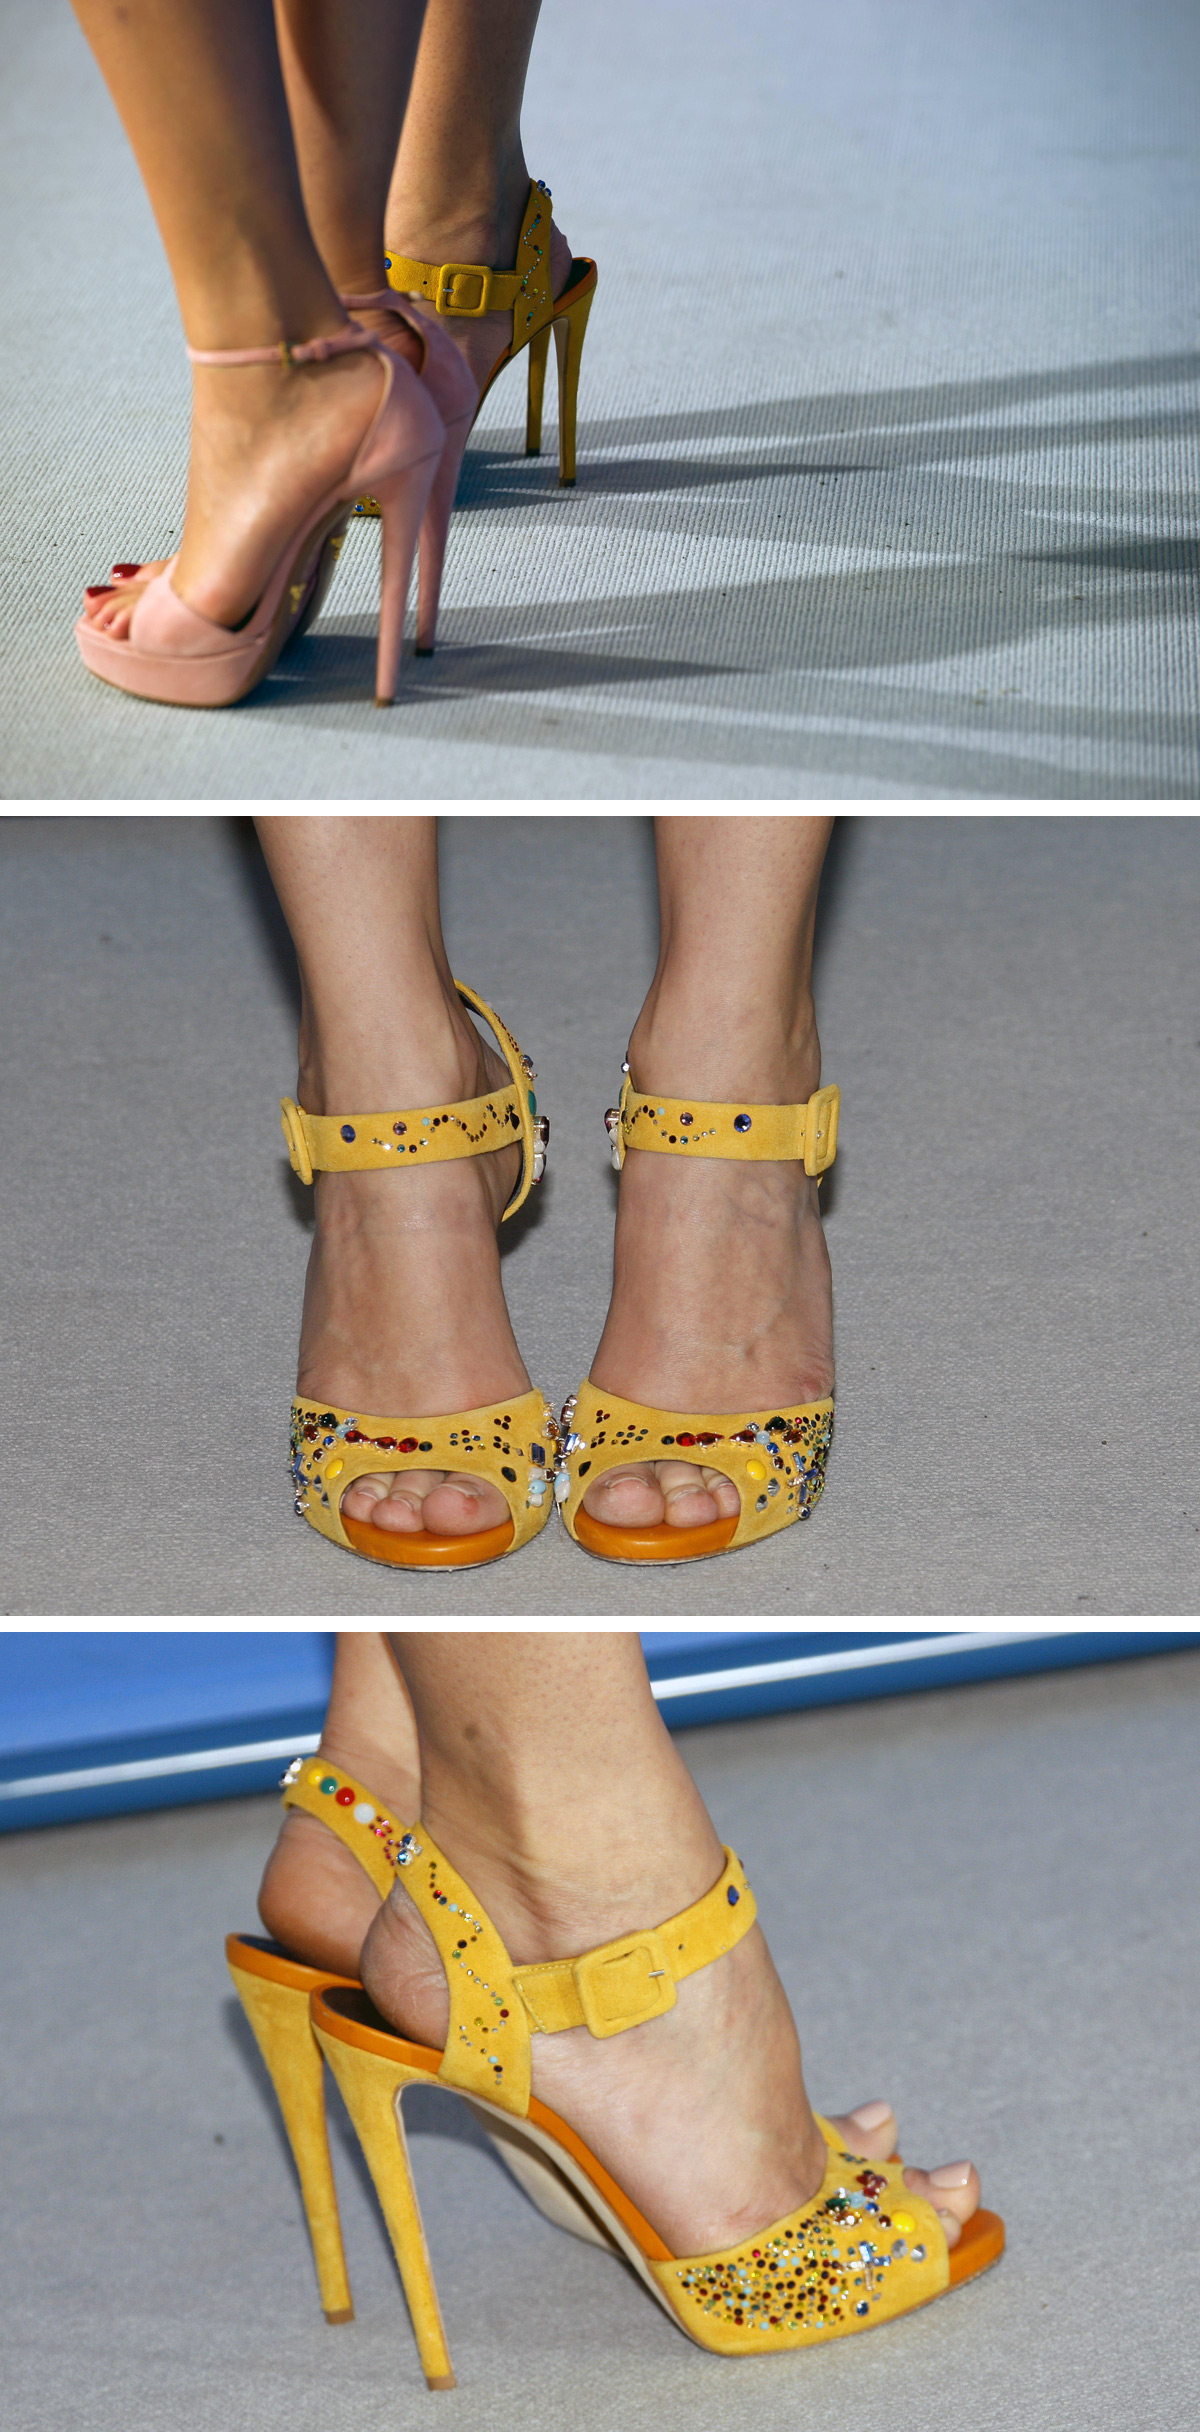 Emma Watson The High Heel Times